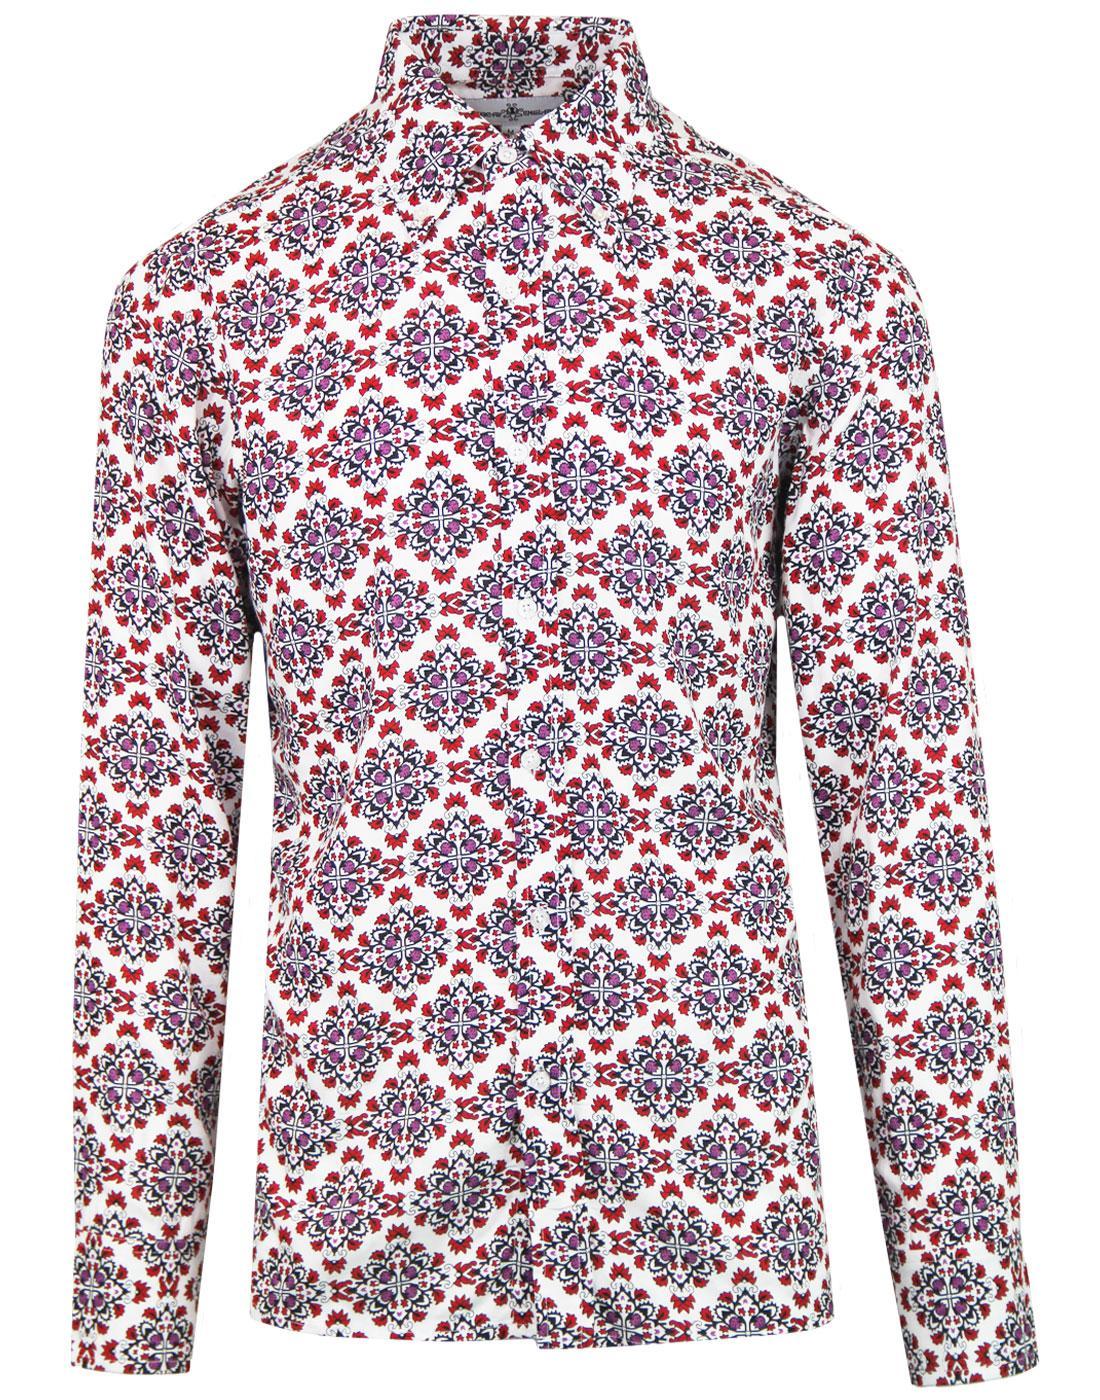 madcap england wallflower retro floral rayon shirt